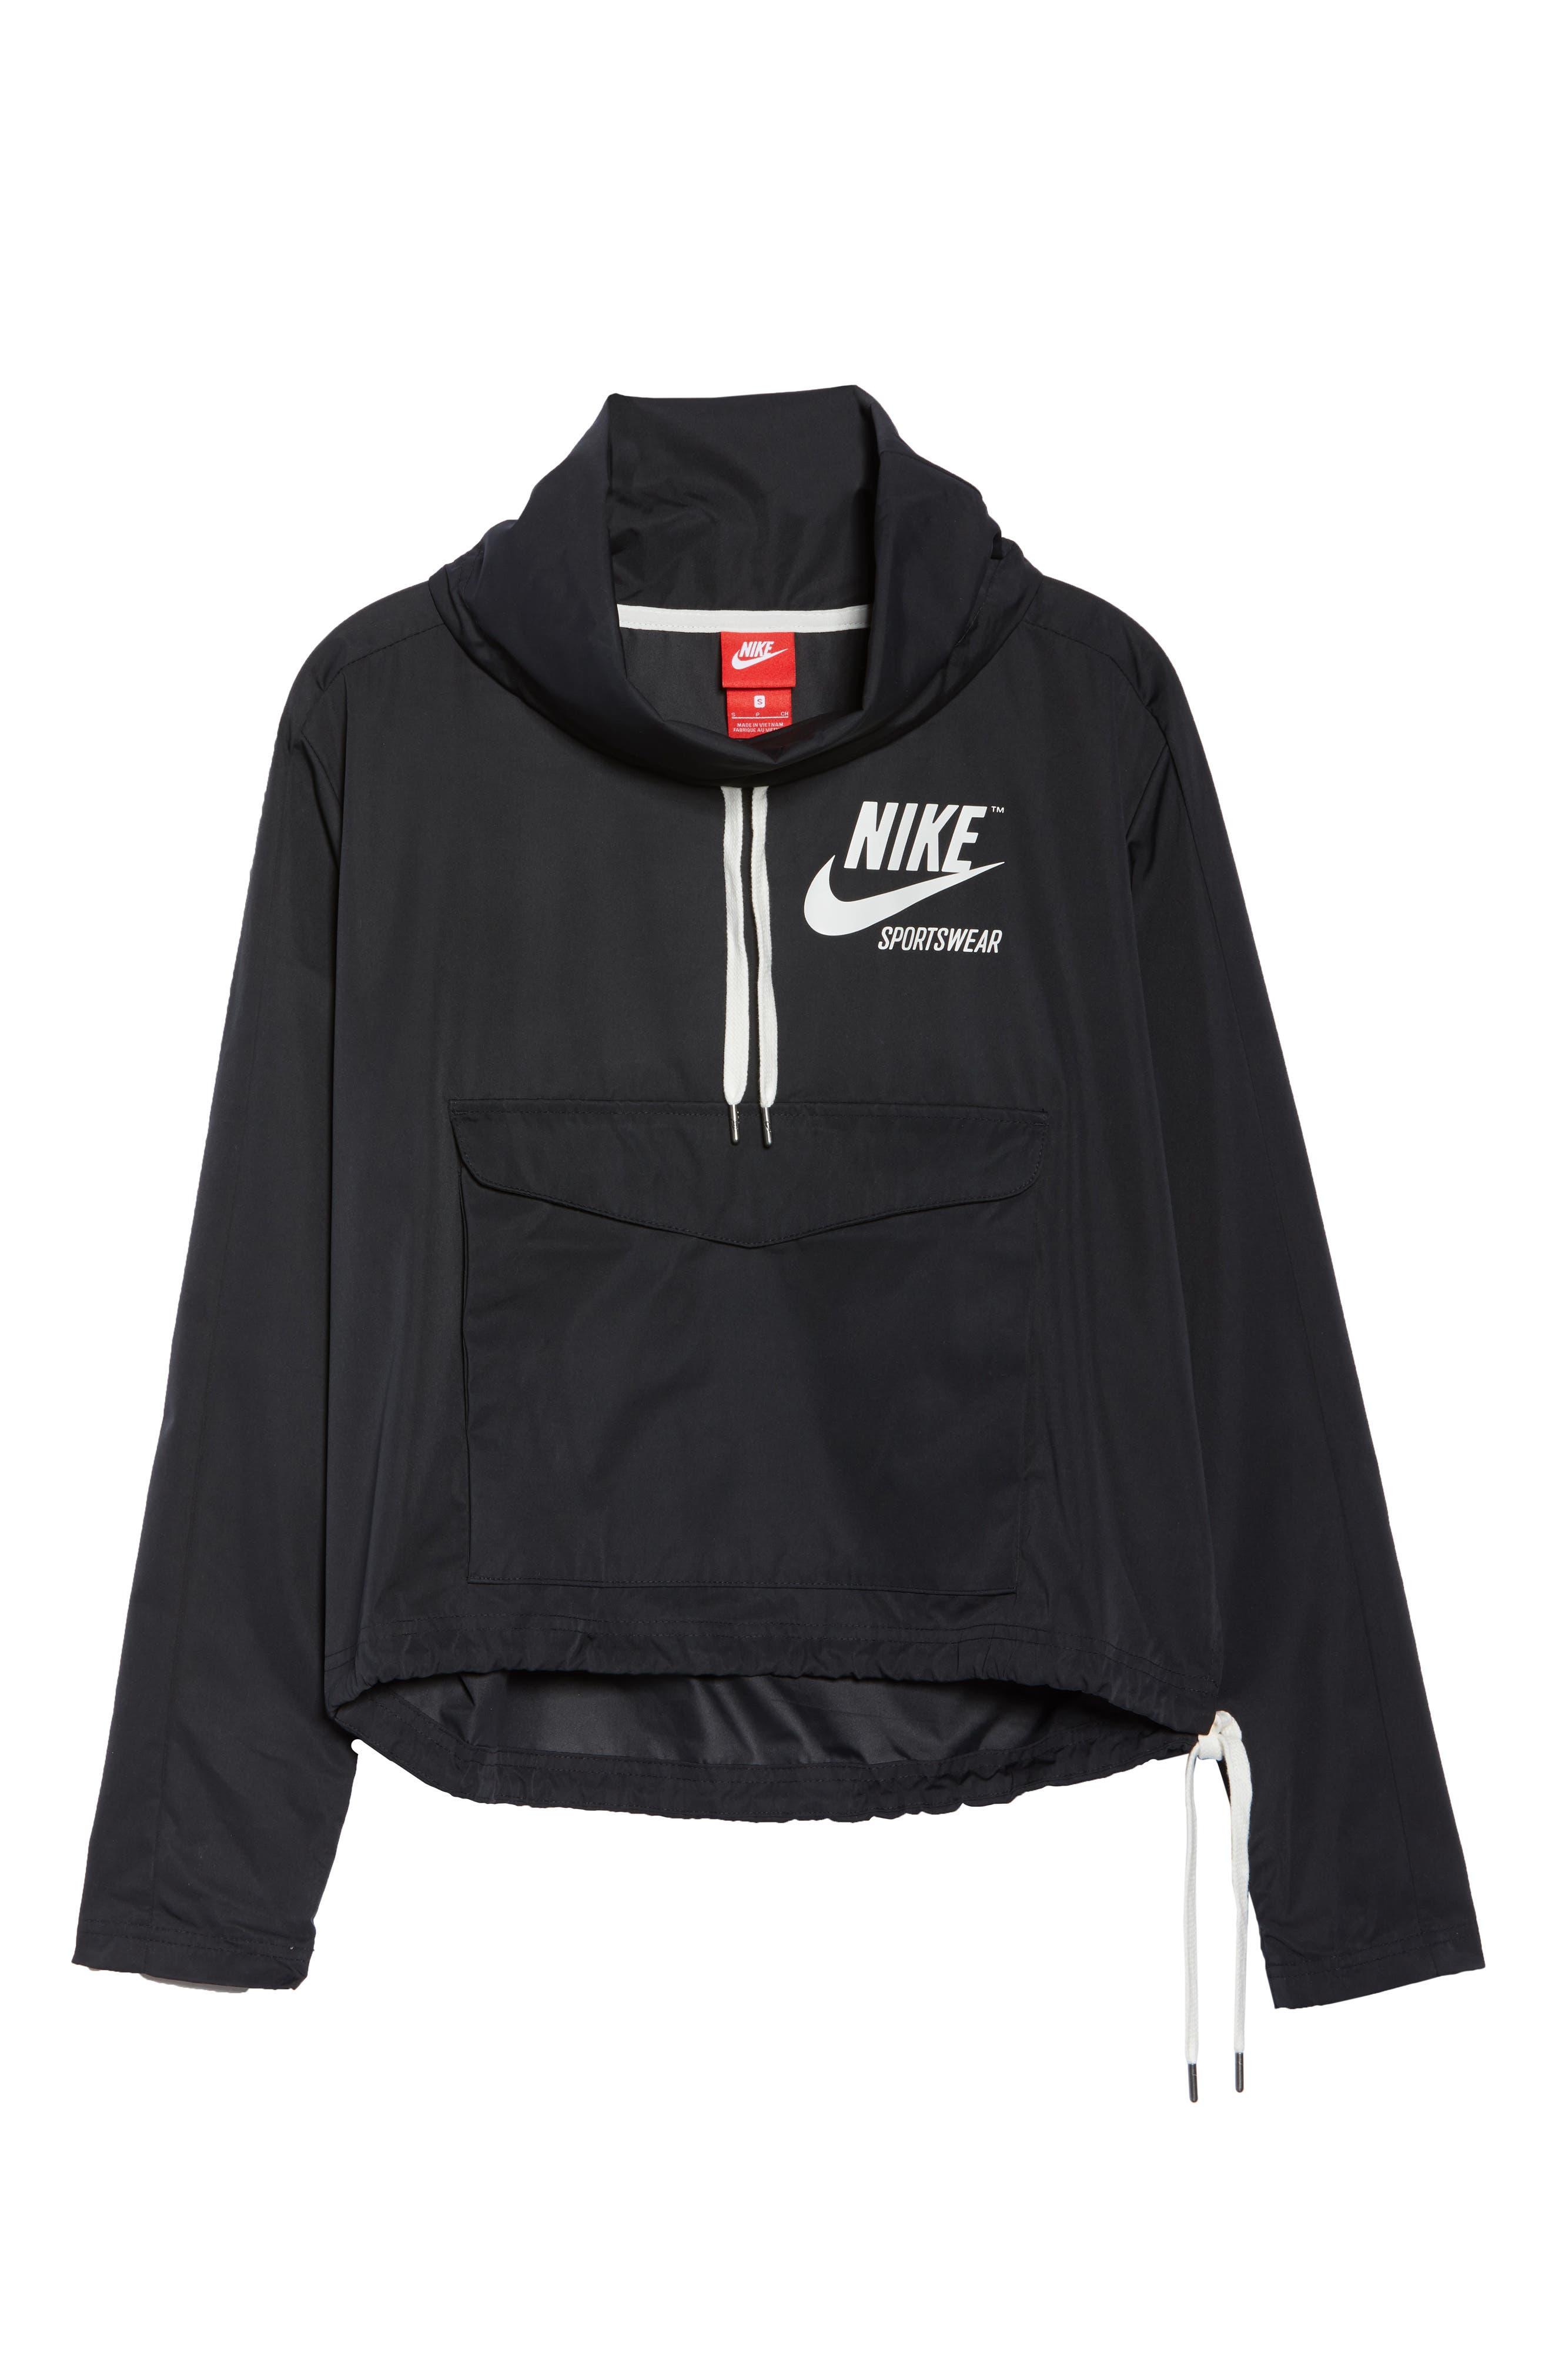 Sportswear Archive Jacket,                             Alternate thumbnail 7, color,                             Black/ Black